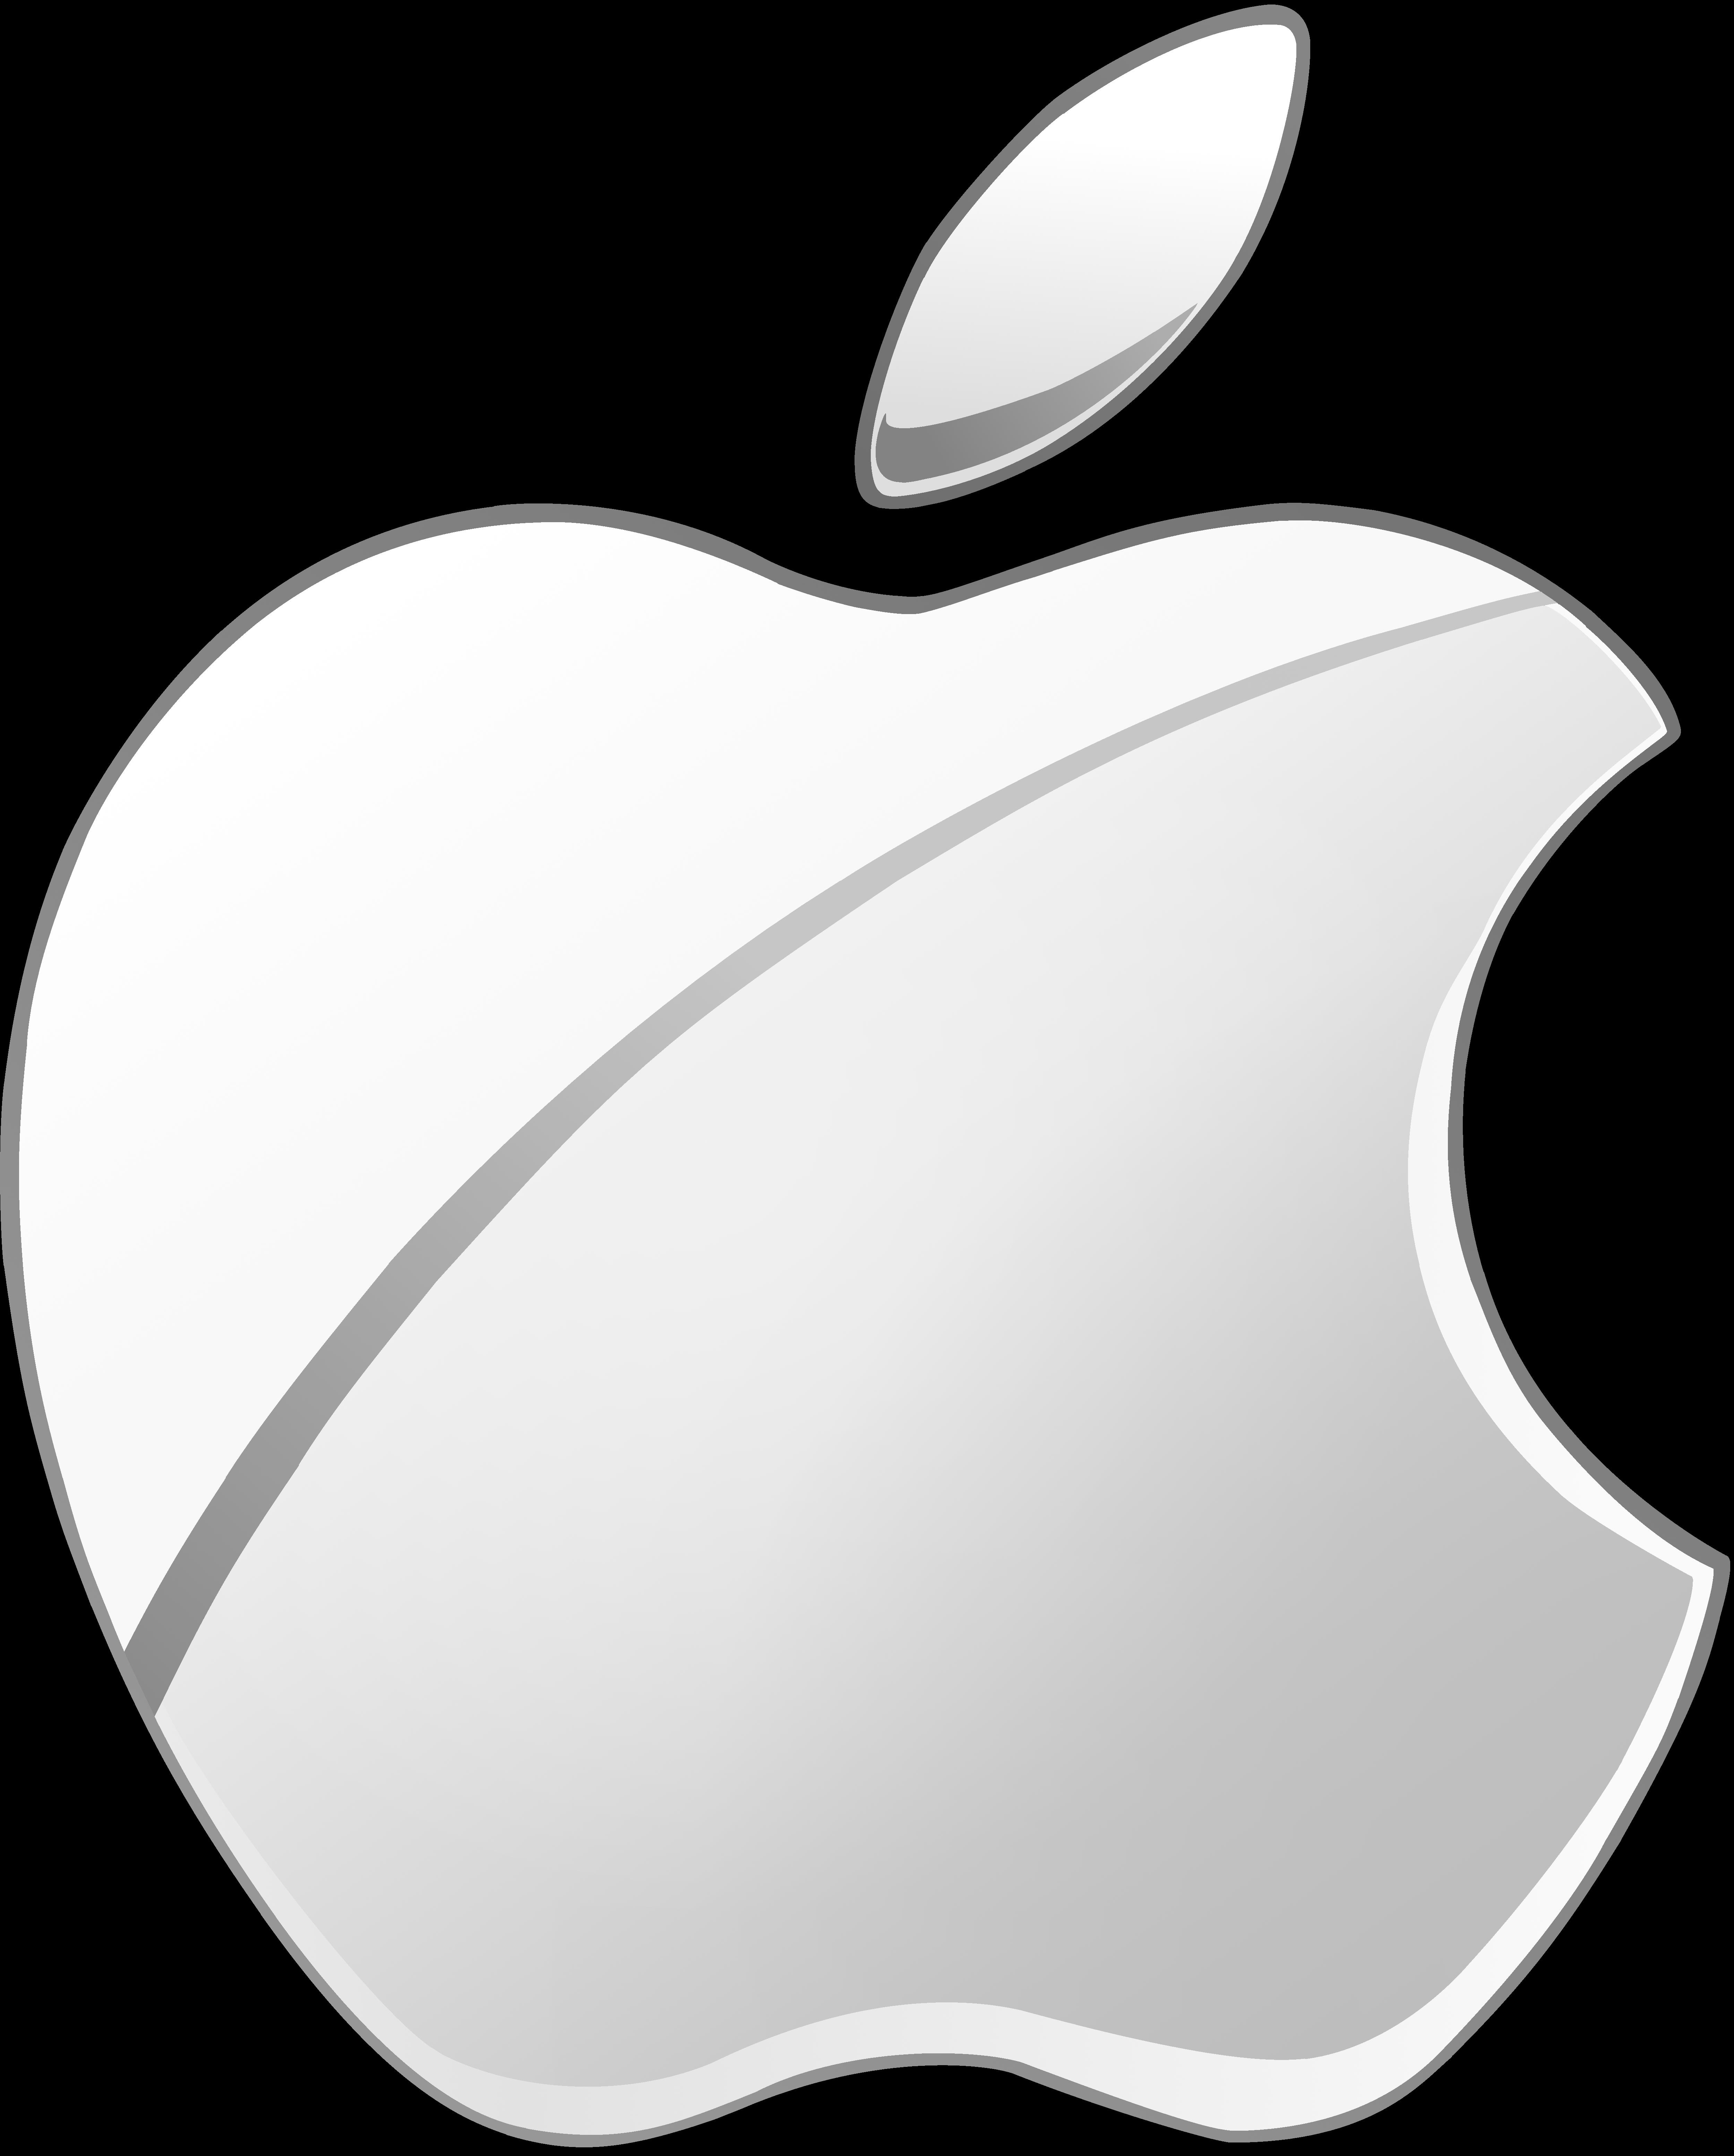 apple logo white vector. gift)silver apple logo vector(2) by windytheplaneh white vector